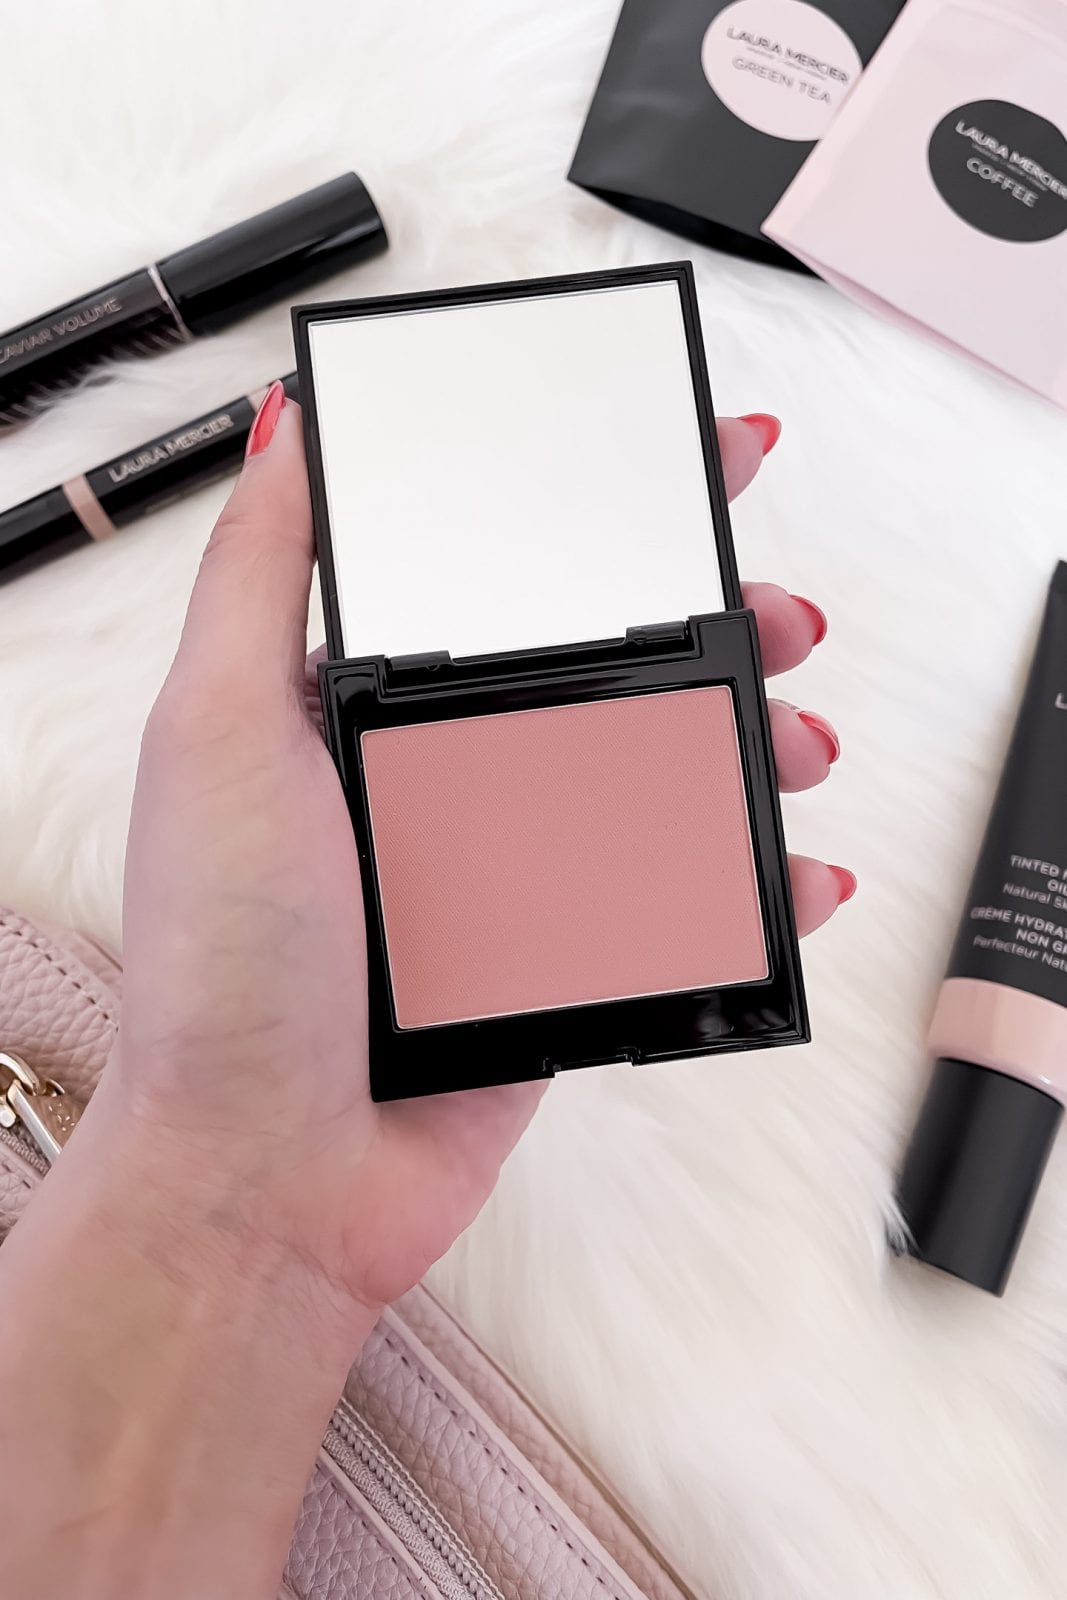 Laura Mercier Blush Color Infusion in Chai  - the perfect matte neutral rose color!